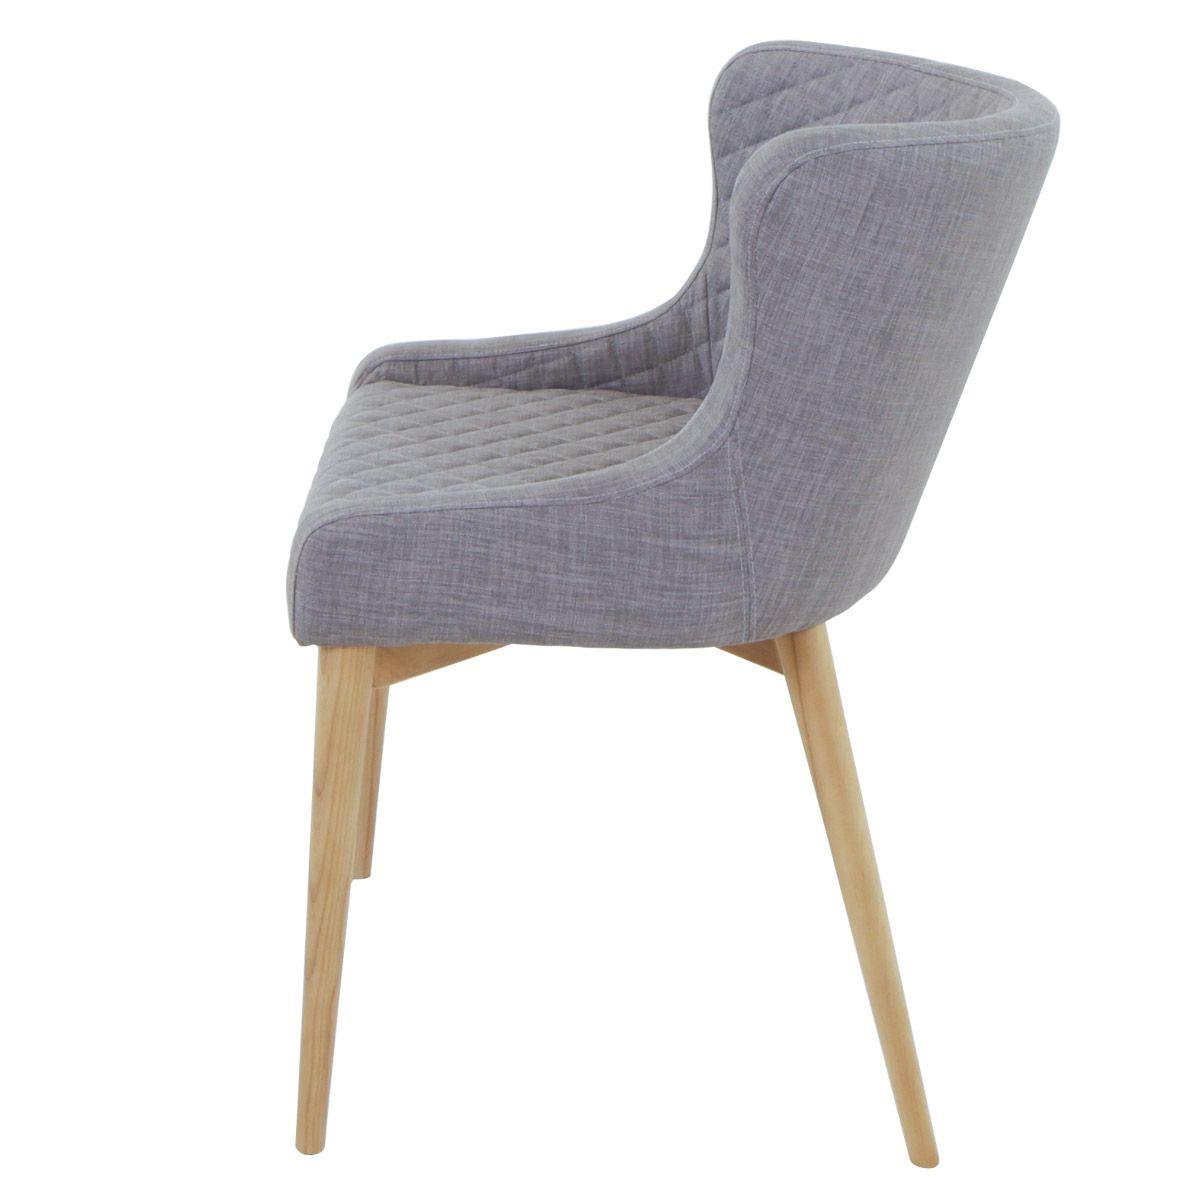 Chaise tissu pieds frêne